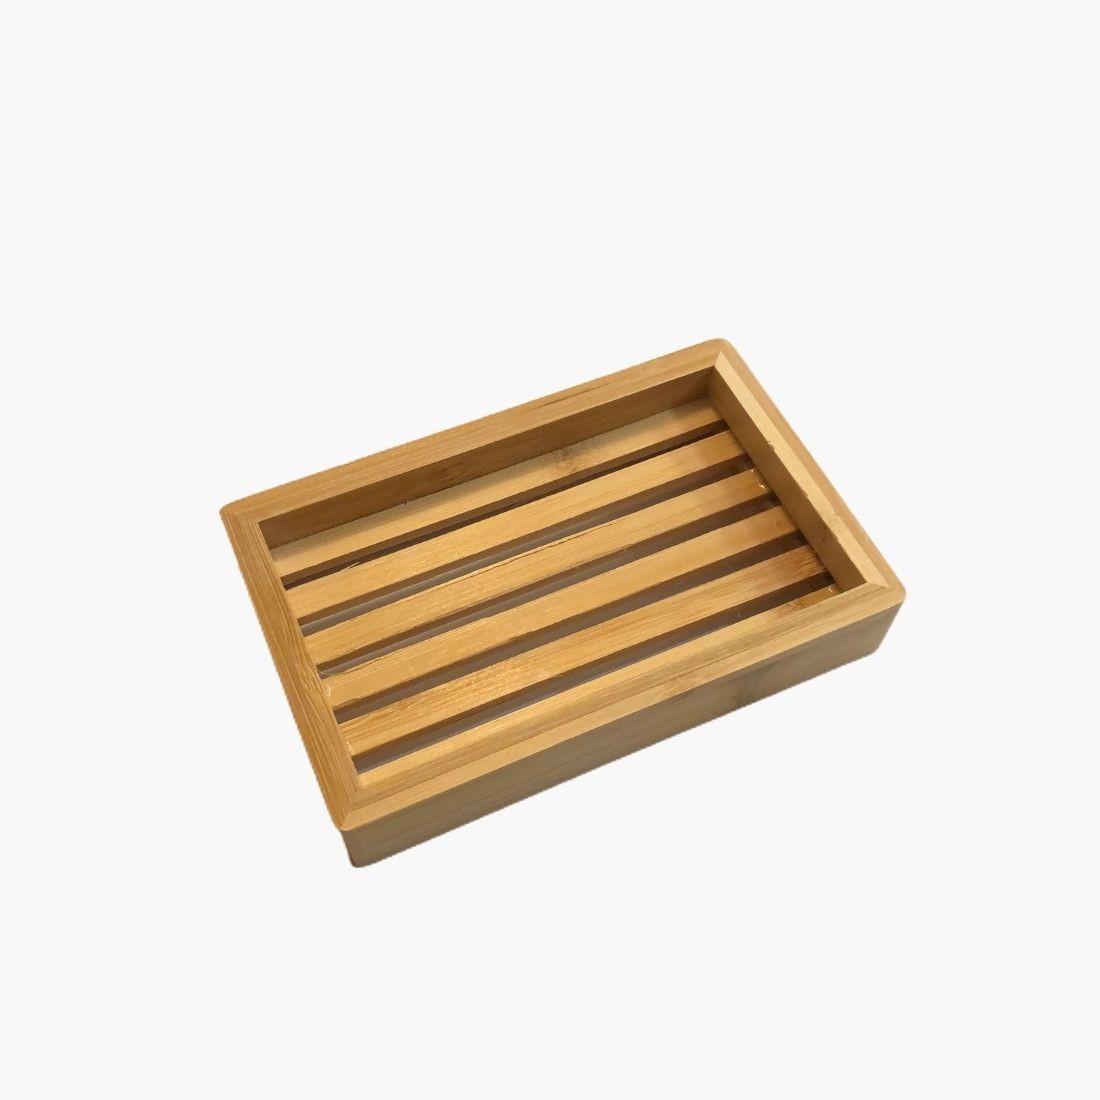 Porte-savon bambou 14x9x2,5